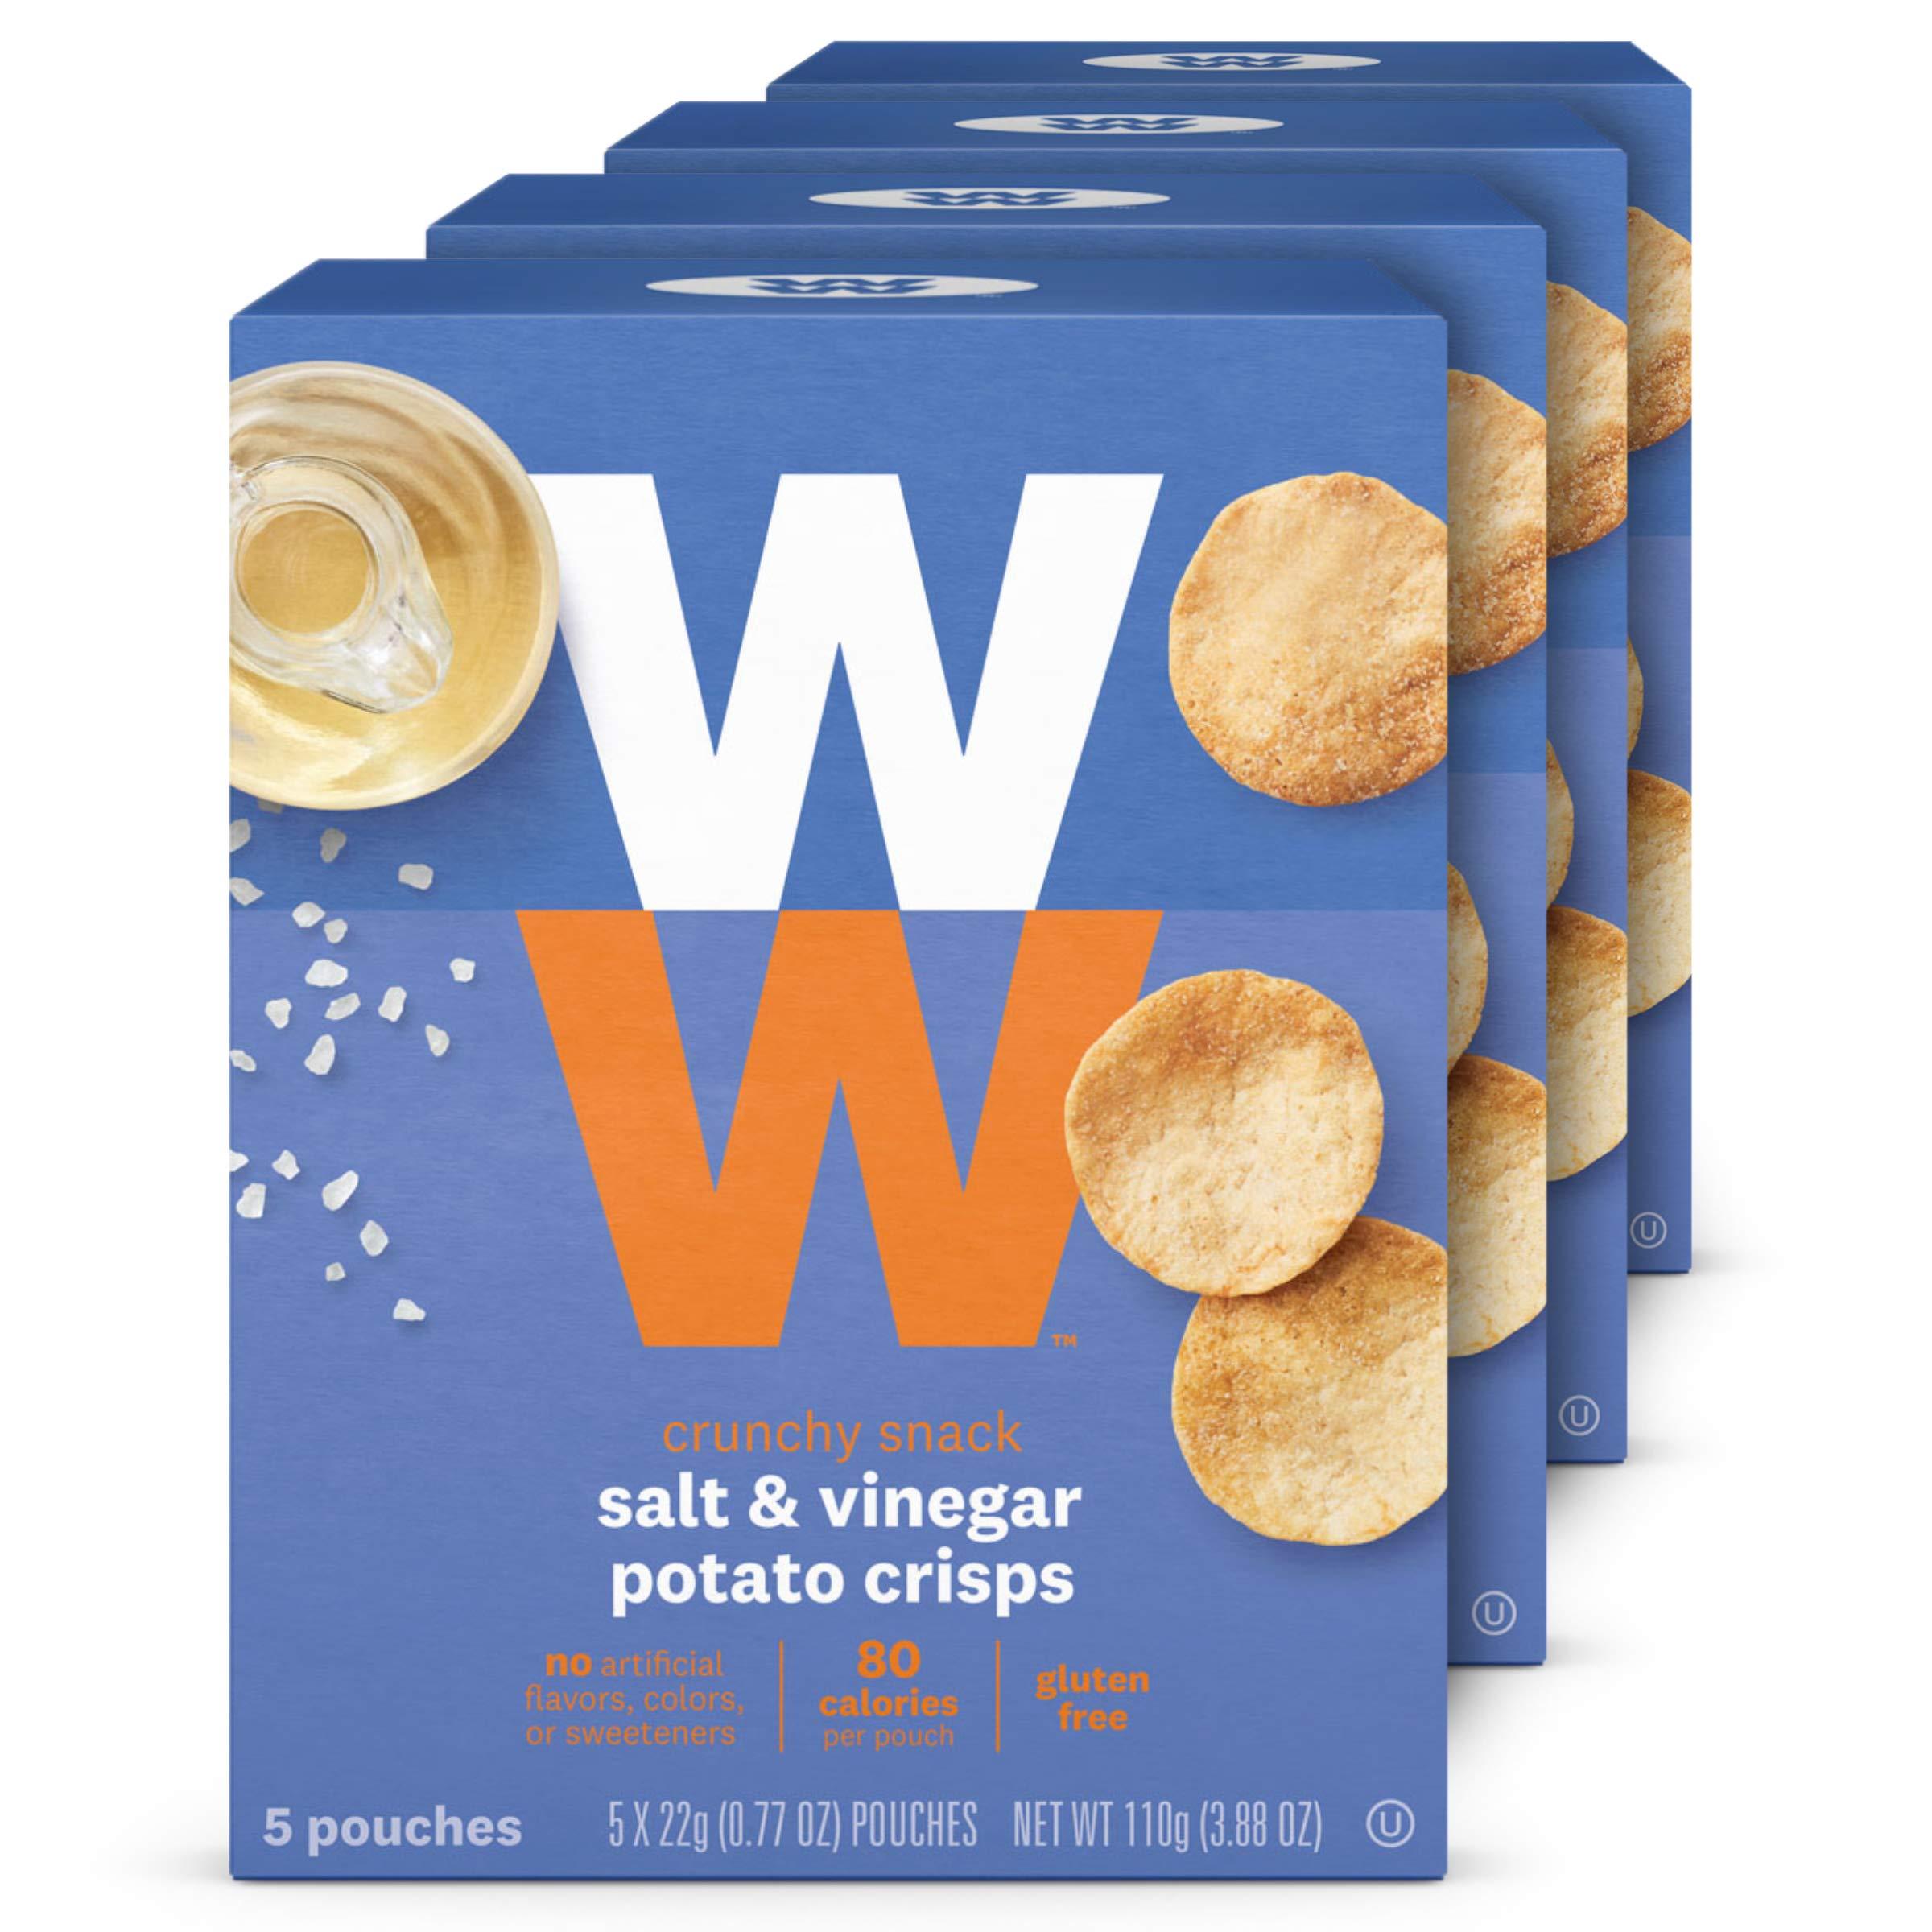 WW Salt and Vinegar Potato Crisps - Gluten-free, 2 SmartPoints - 4 Boxes (20 Count Total) - Weight Watchers Reimagined by WW